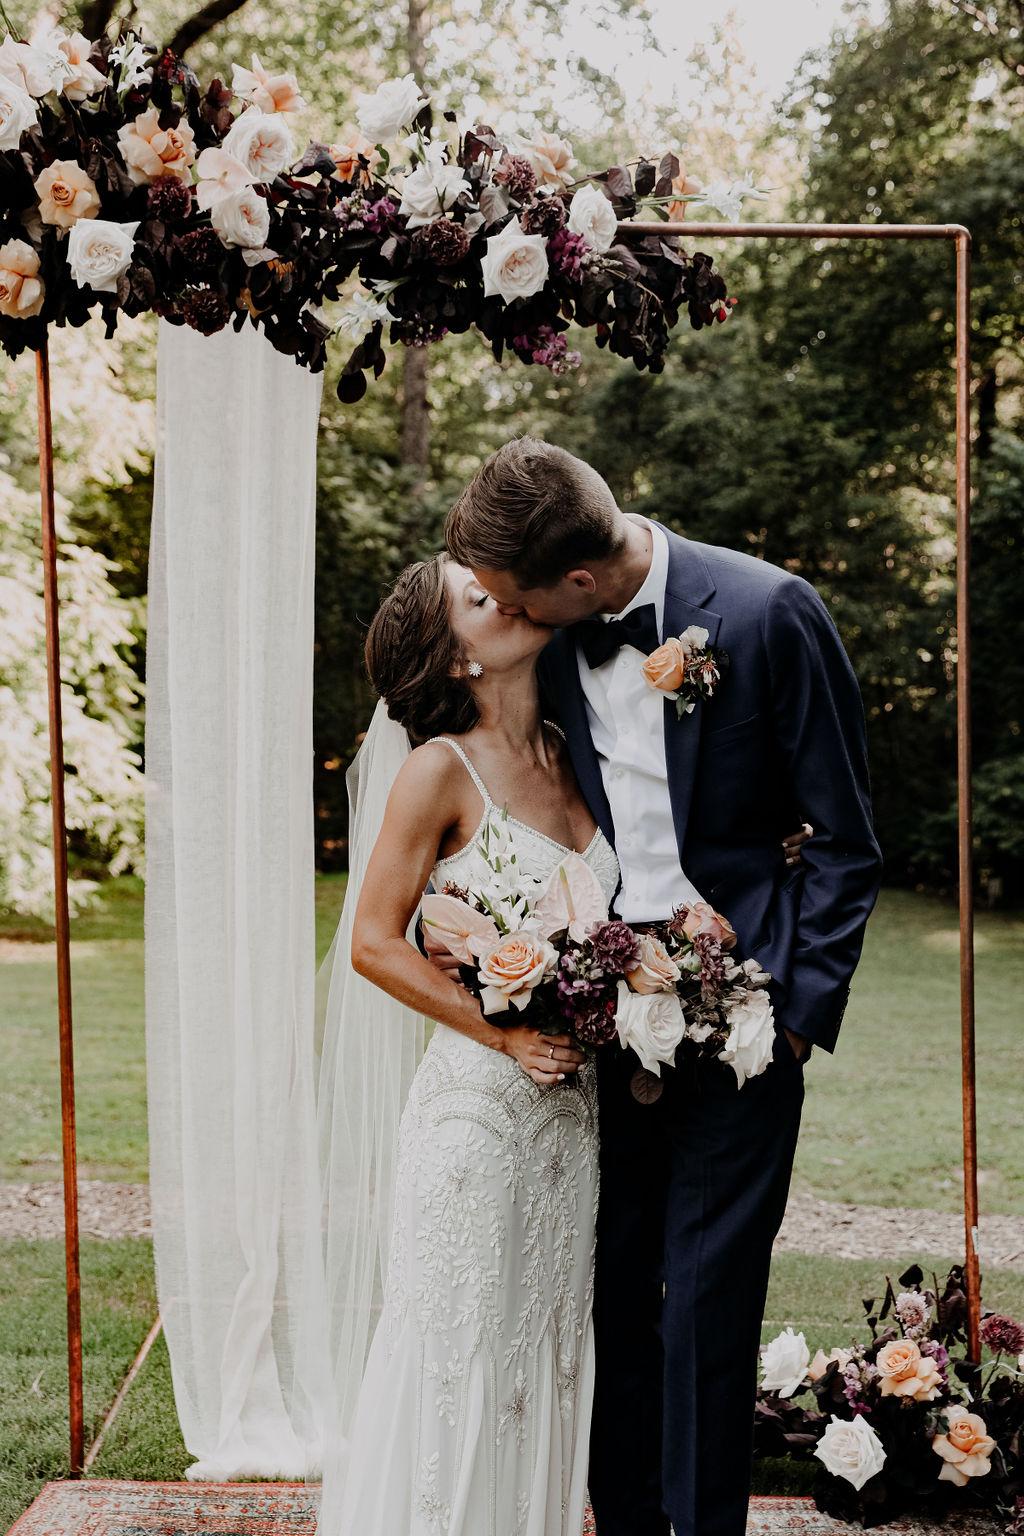 A New Spin on Boho Modern Wedding Flowers